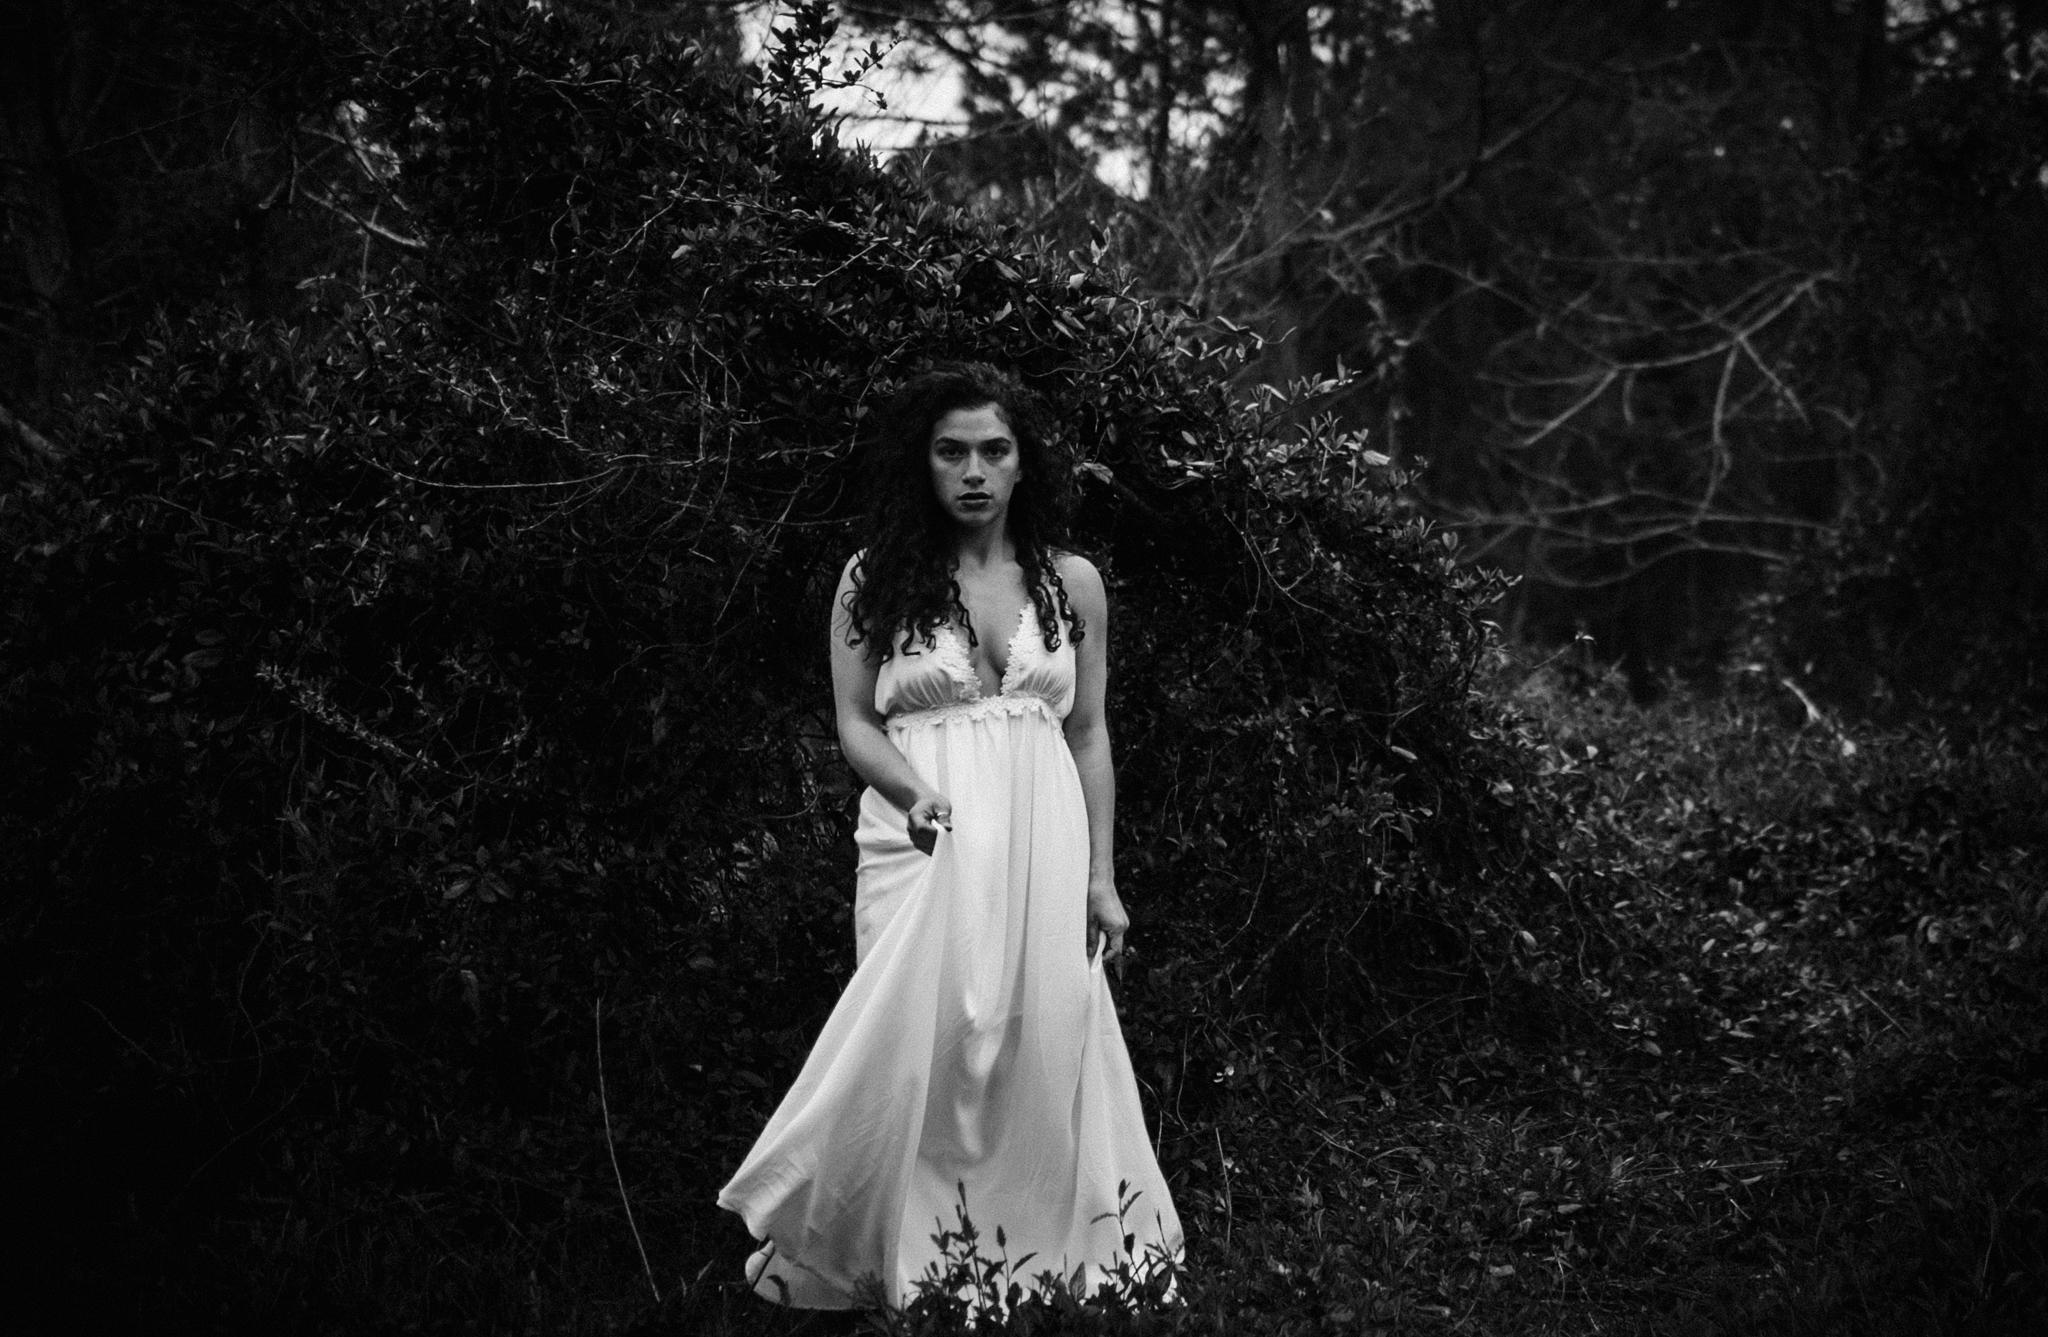 Jessica.VirginiaBeach.Virginia.Boudoir.emotivestorytelling-14.JPG